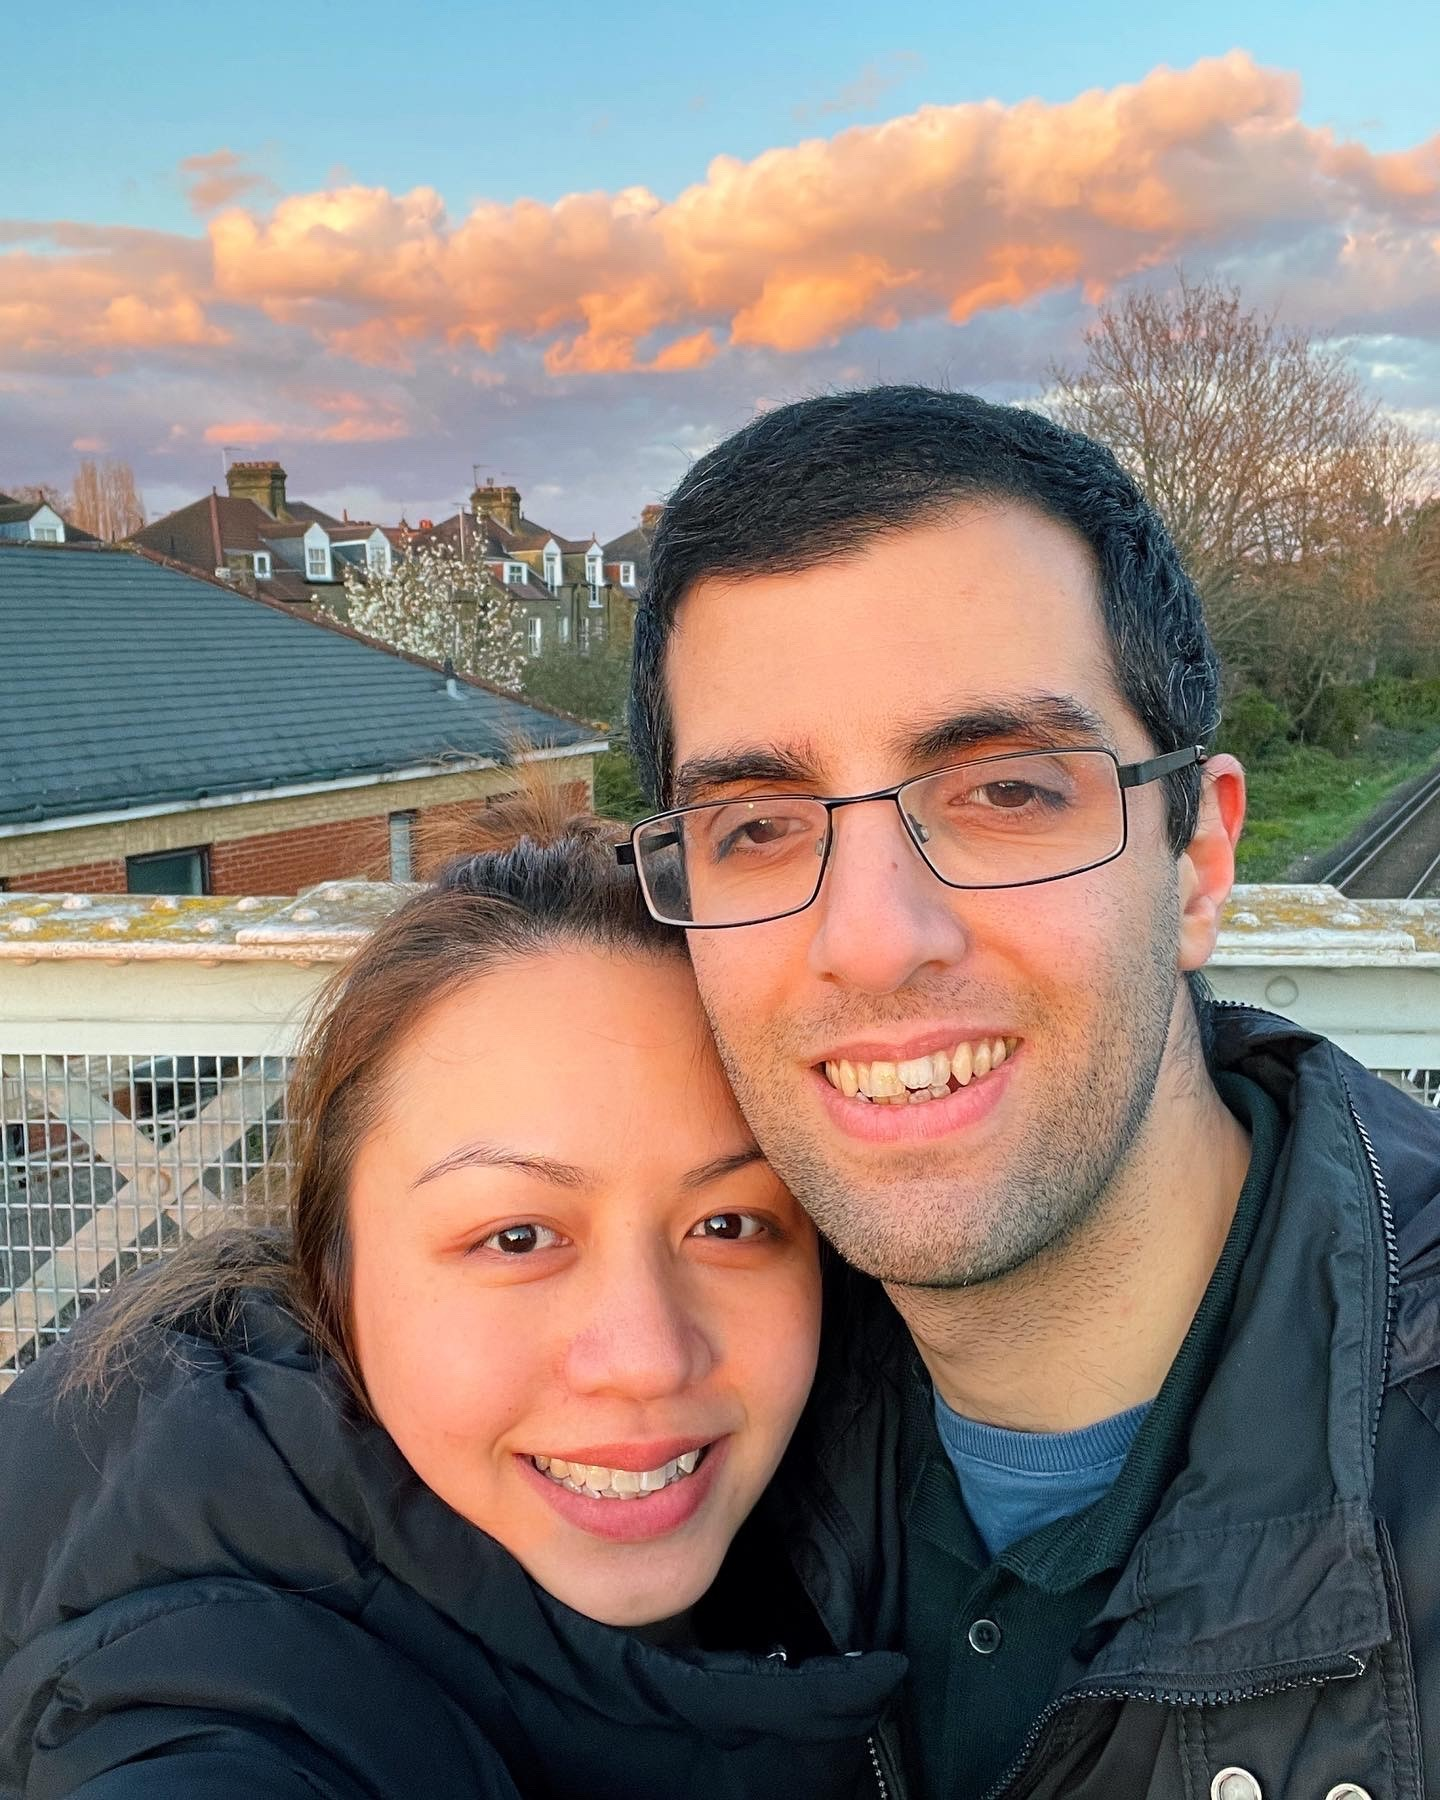 Ezabel and Alireza live together in Putney